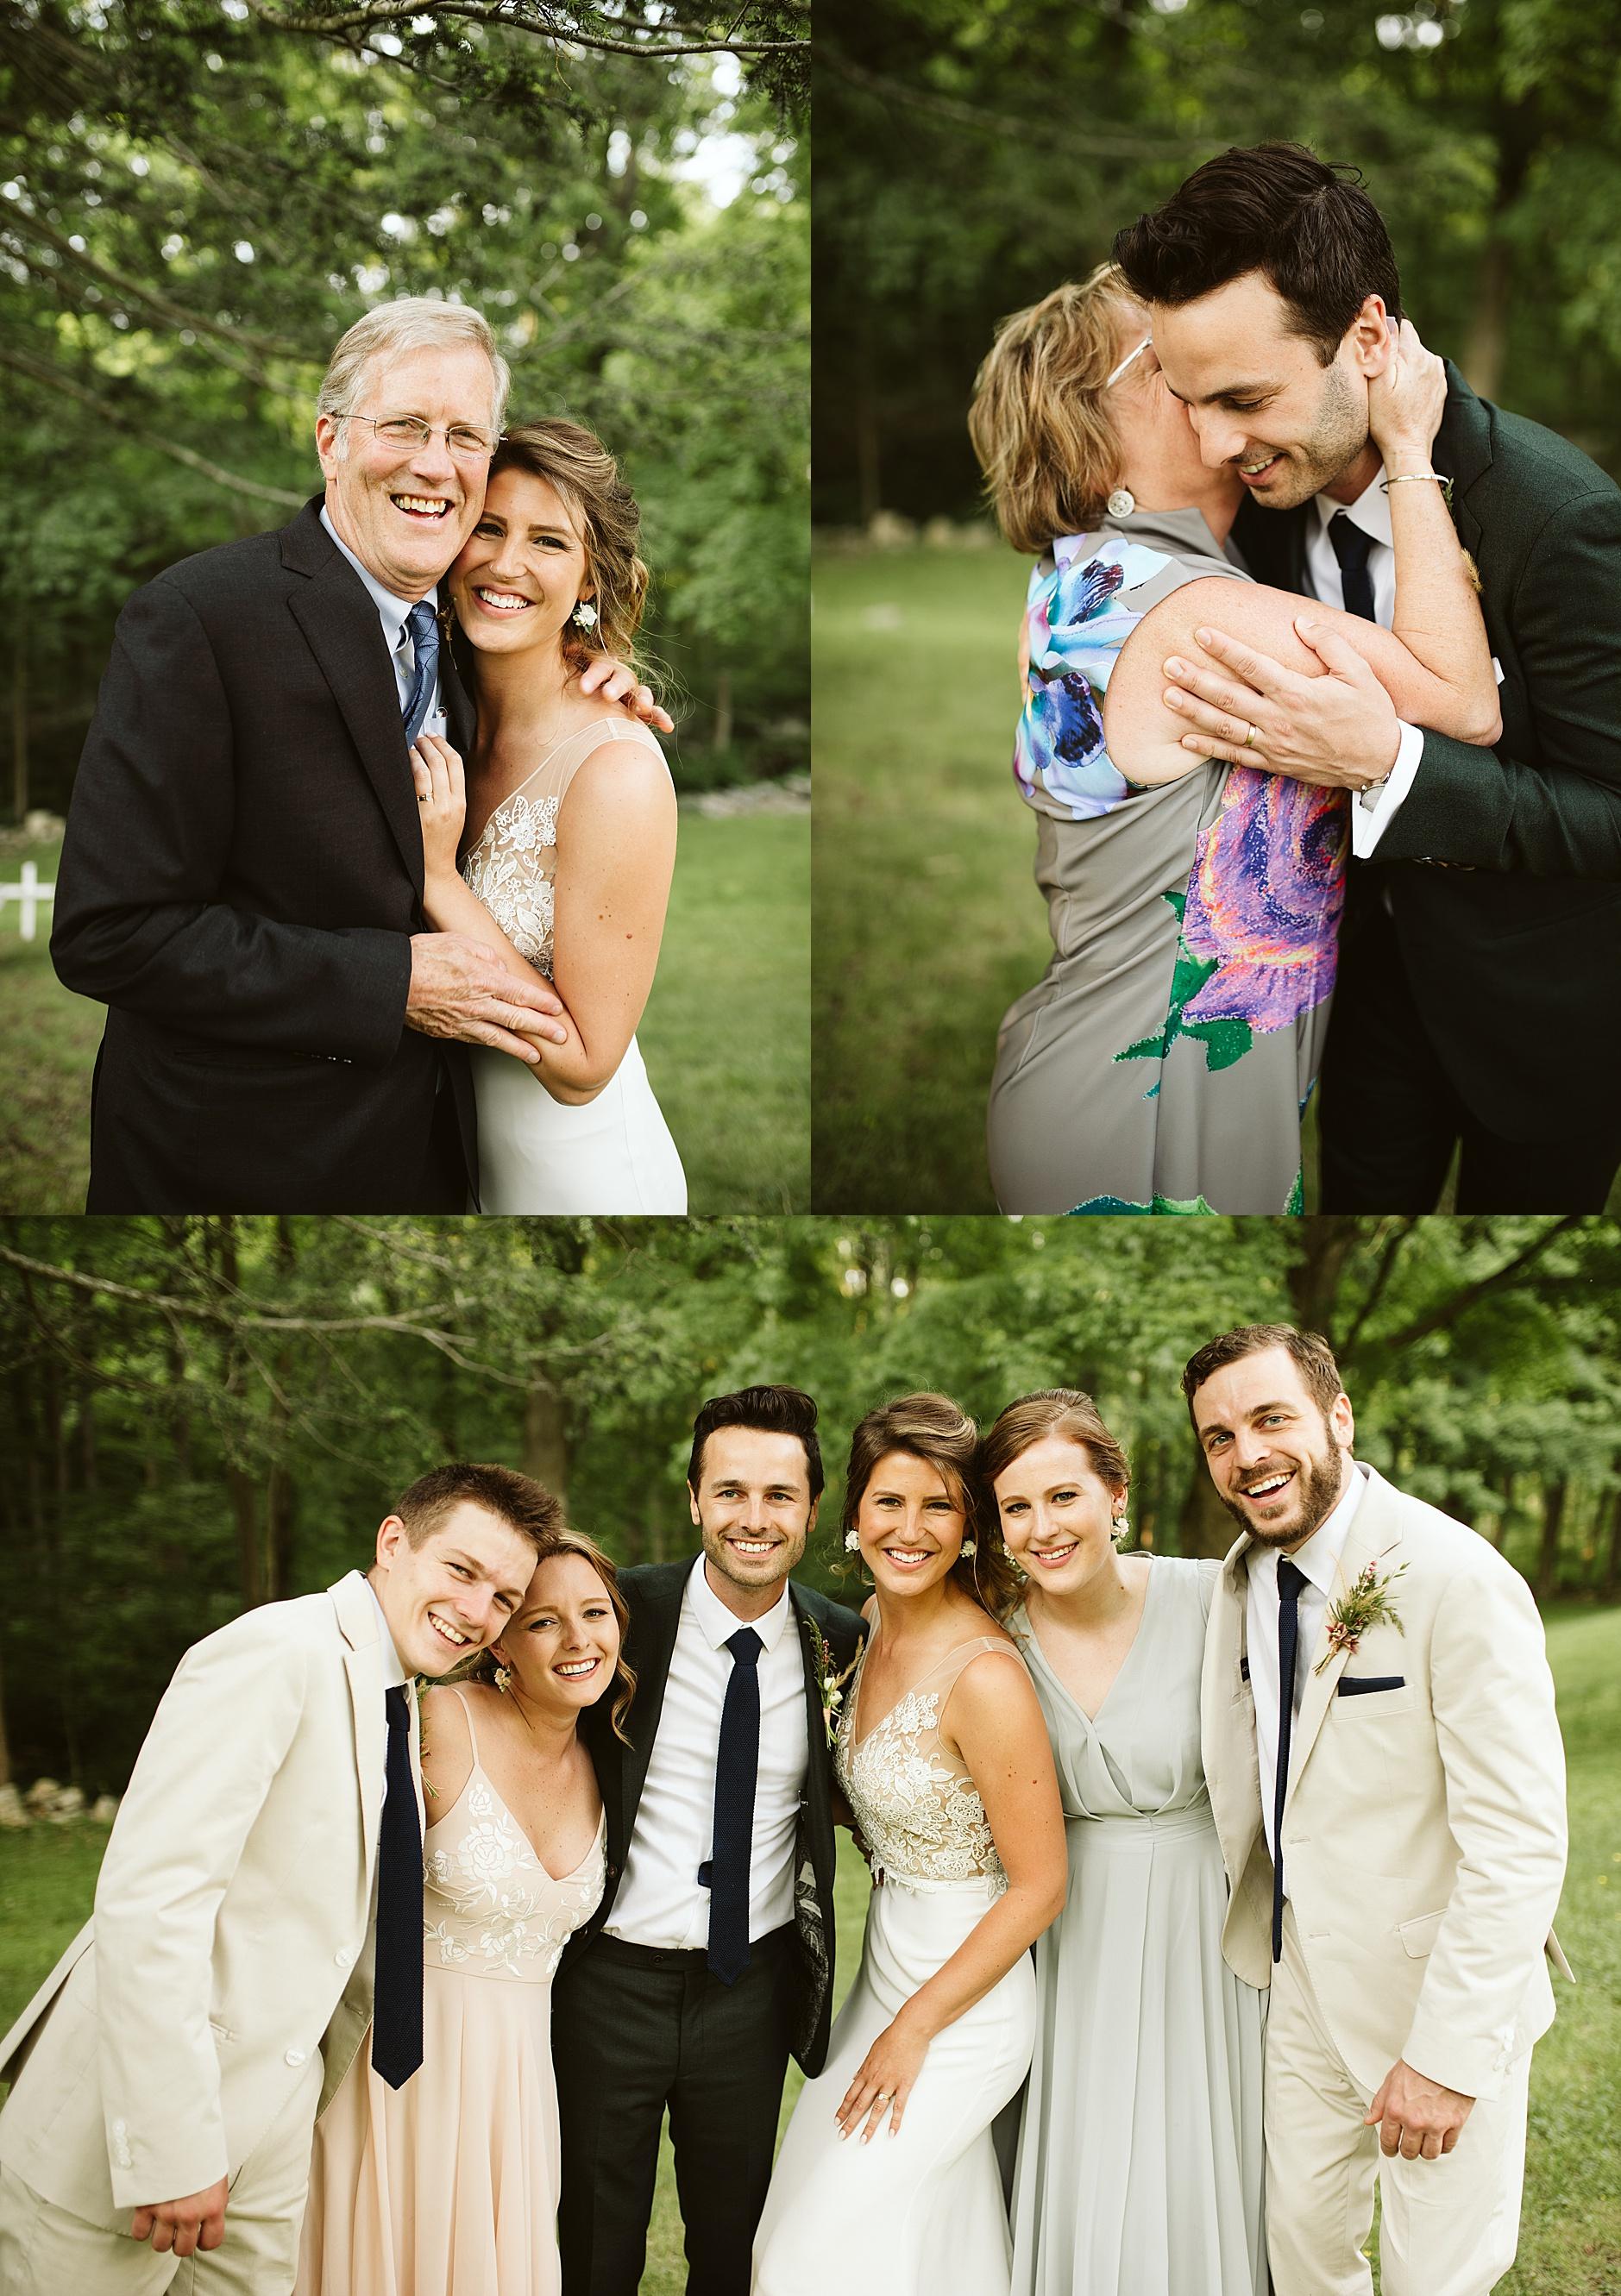 Summer Wedding in Upstate New York